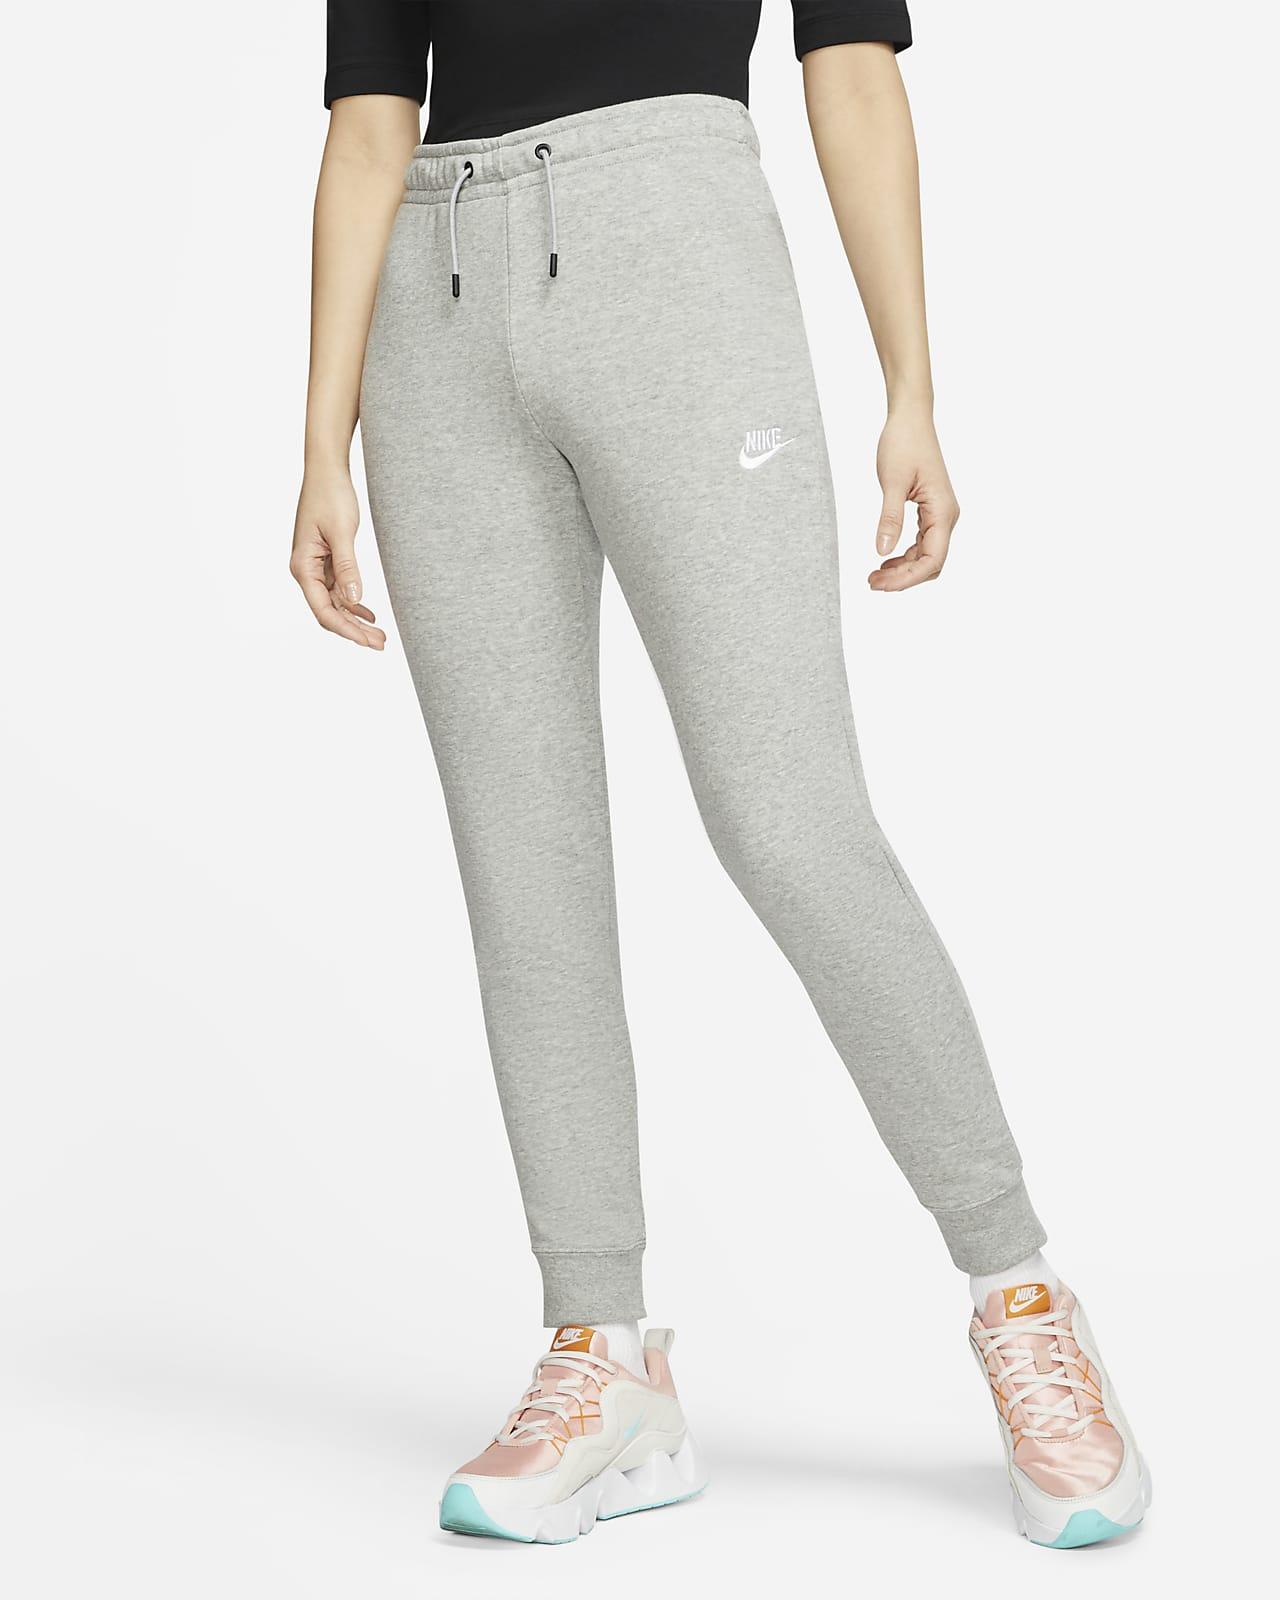 Nike Sportswear Essential Fleecebroek voor dames